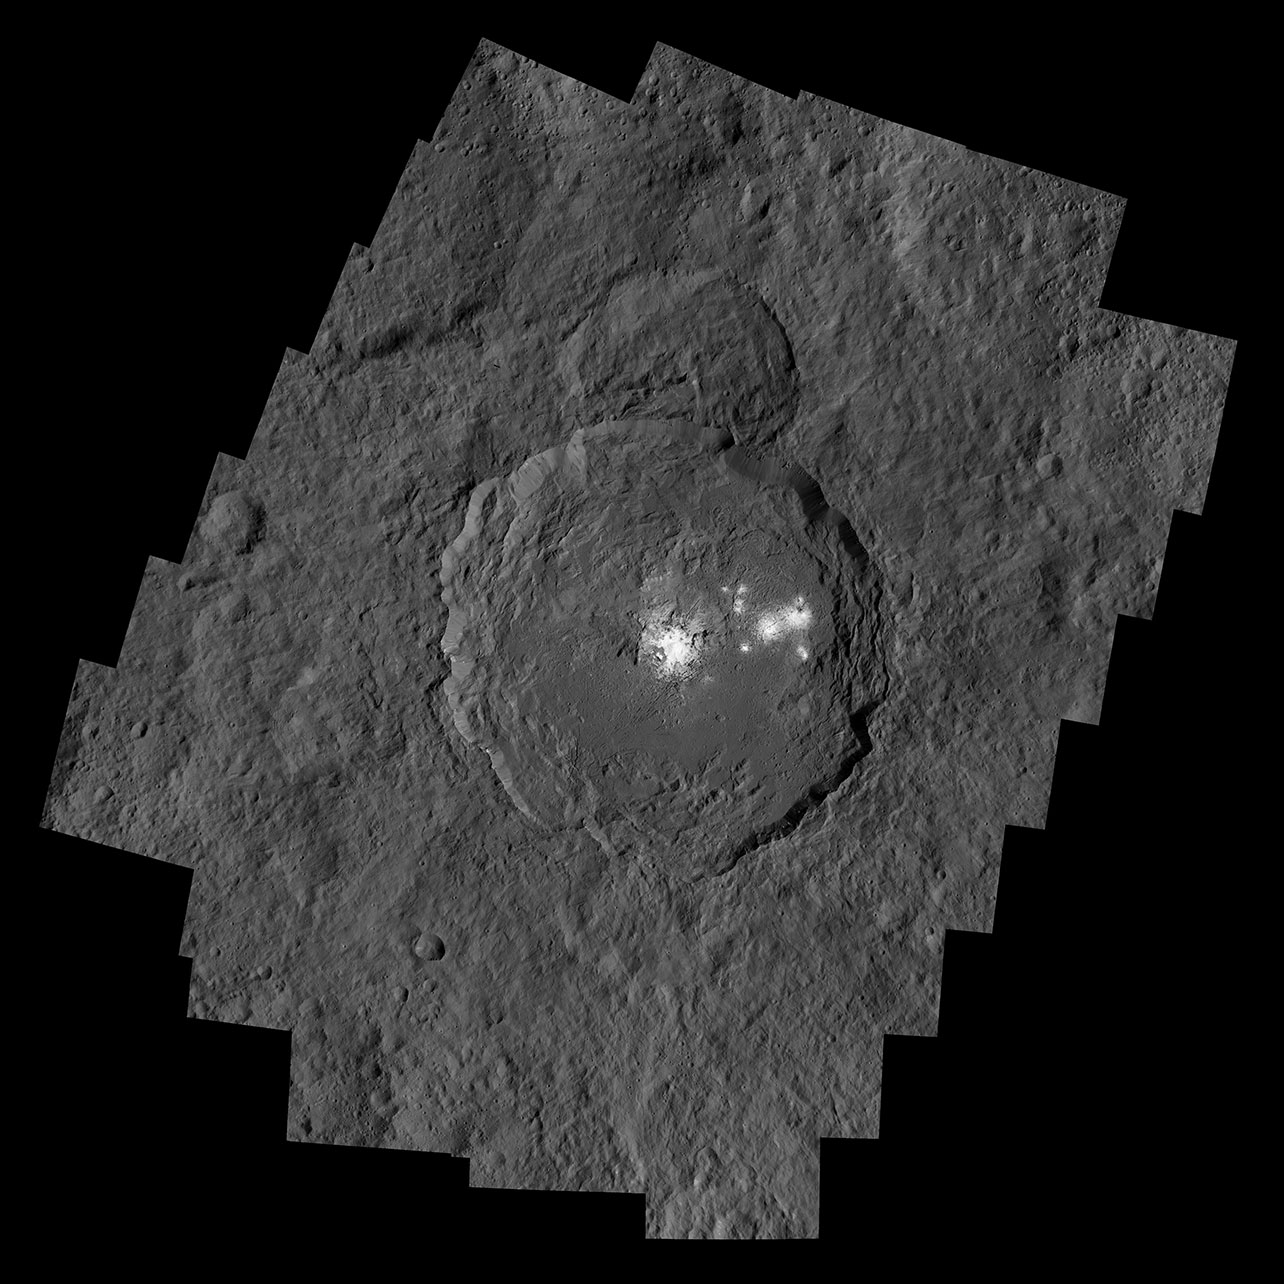 Occator Krateri. [NASA/JPL-Caltech/UCLA/MPS/DLR/IDA/PSI]